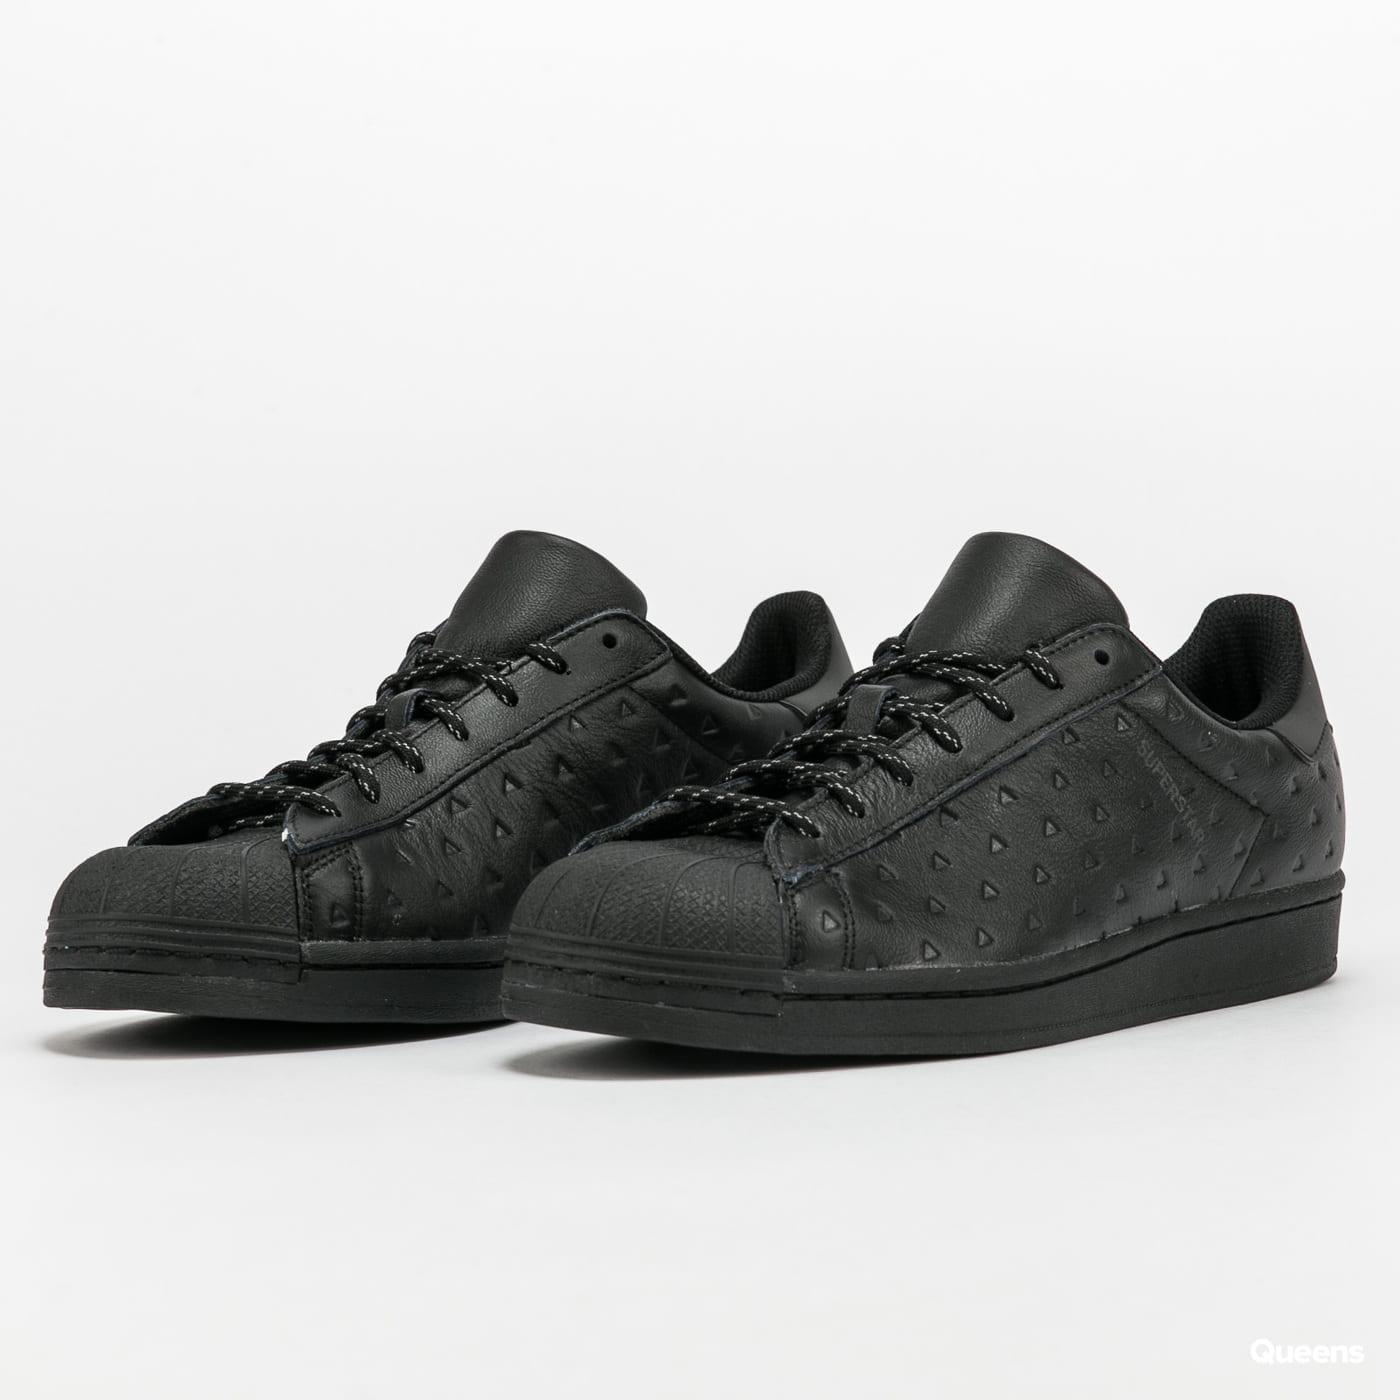 adidas Originals Pharrell Williams Superstar cblack / cblack / cblack